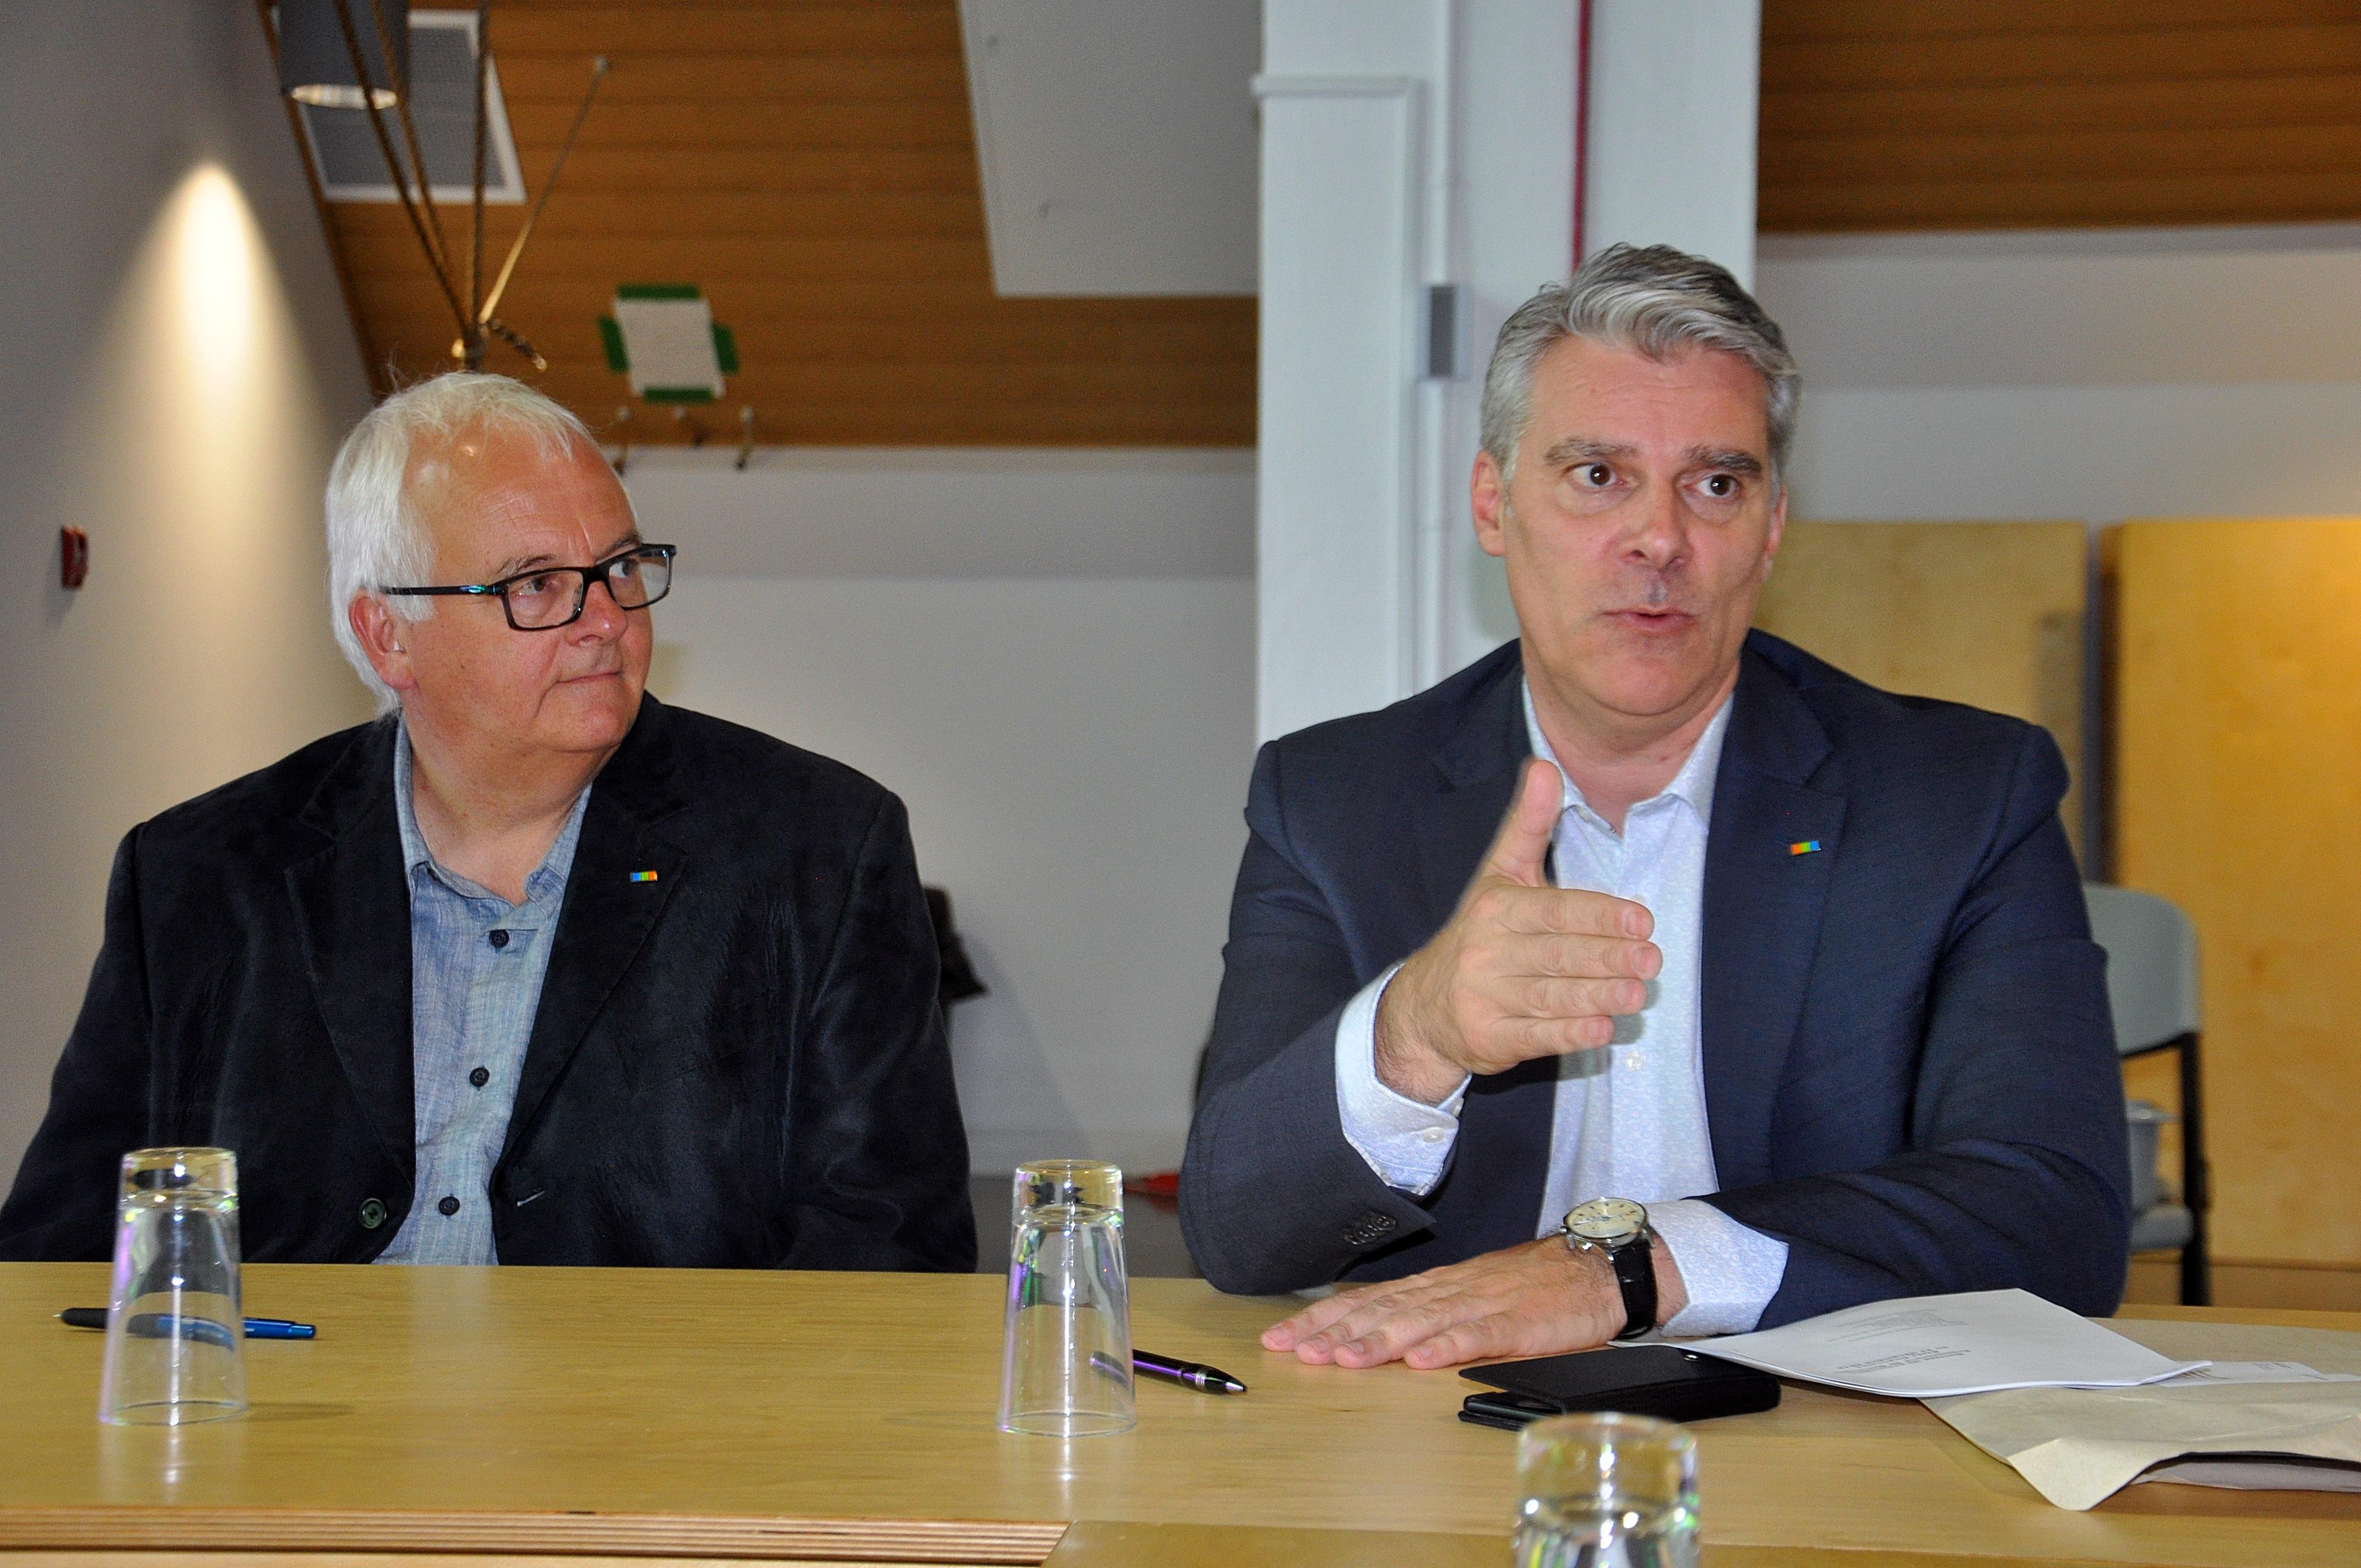 Jean Pouliot et Martin Beaulieu